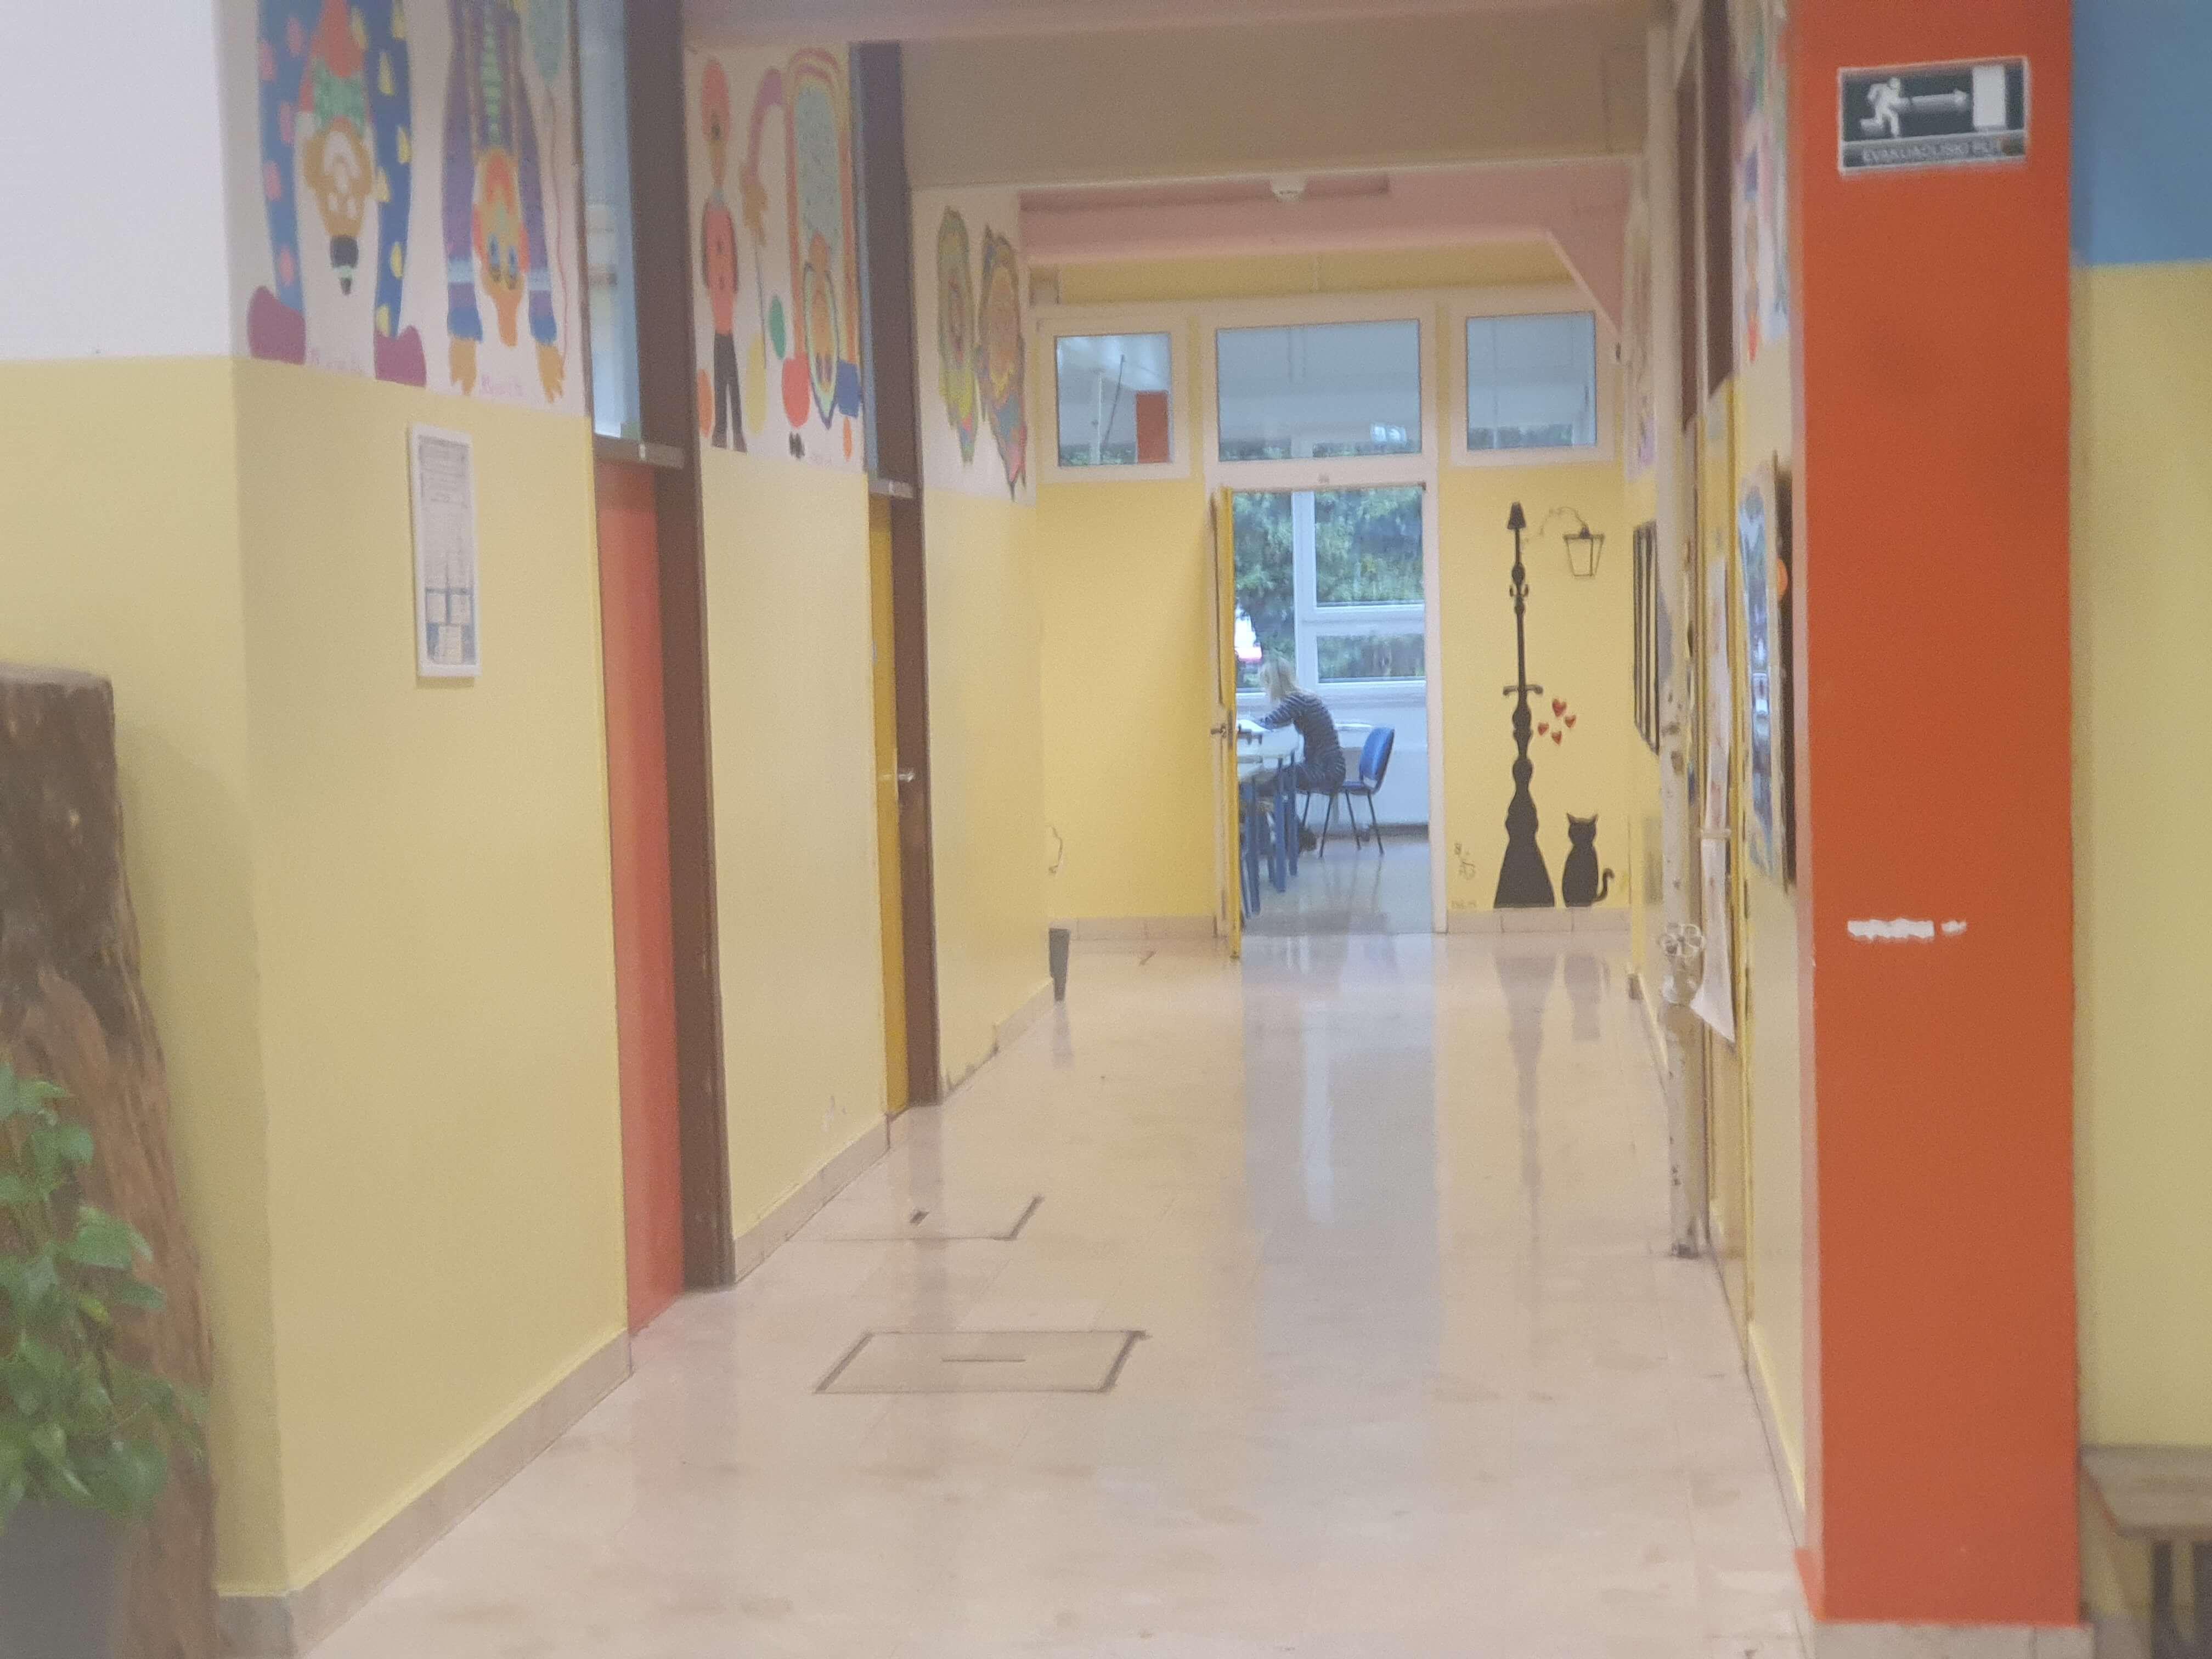 prazan hodnik škole u štrajku